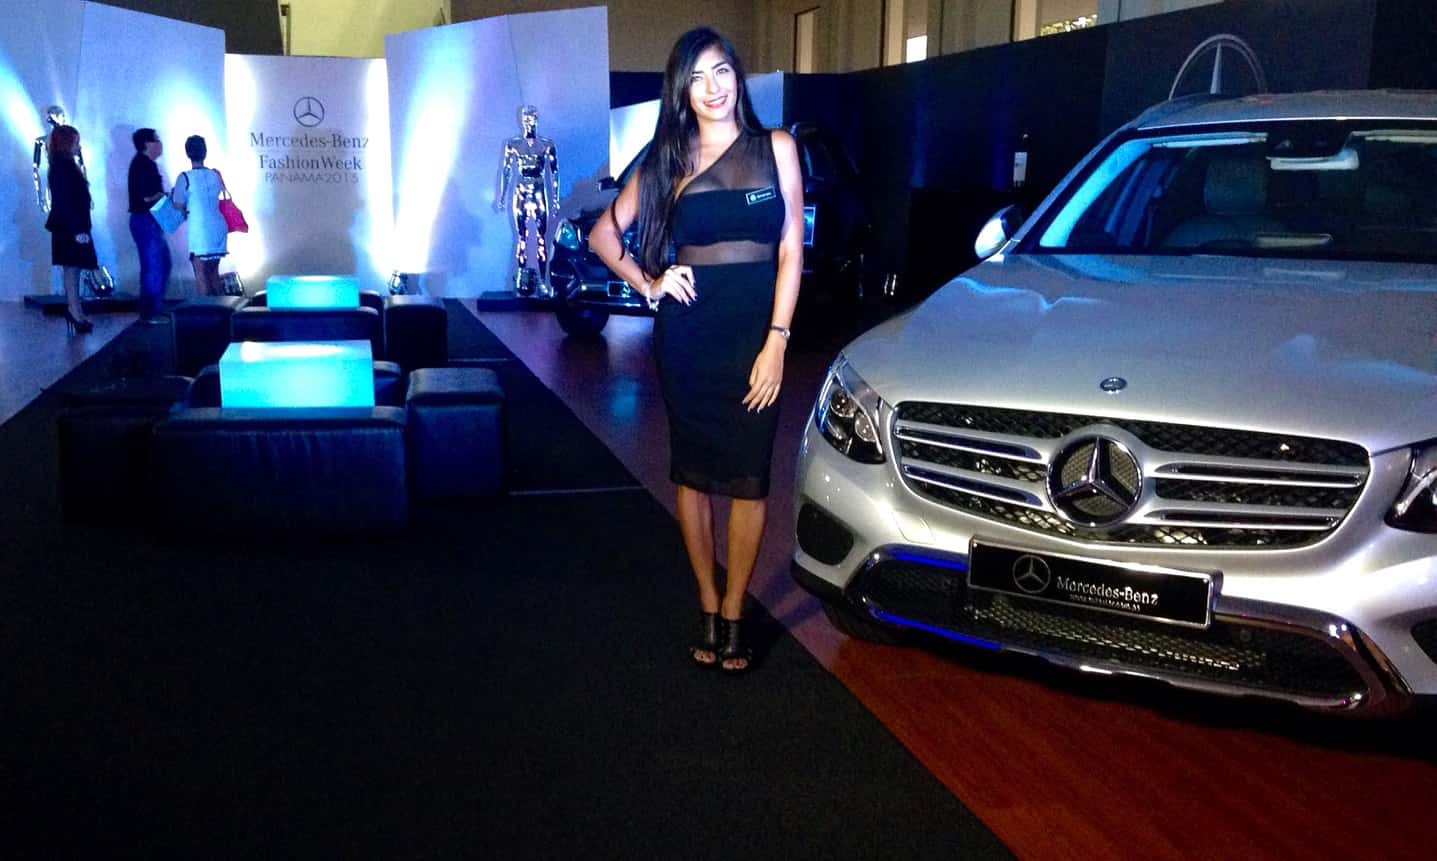 Mercedes-Benz Fashion Week Panamá 2015